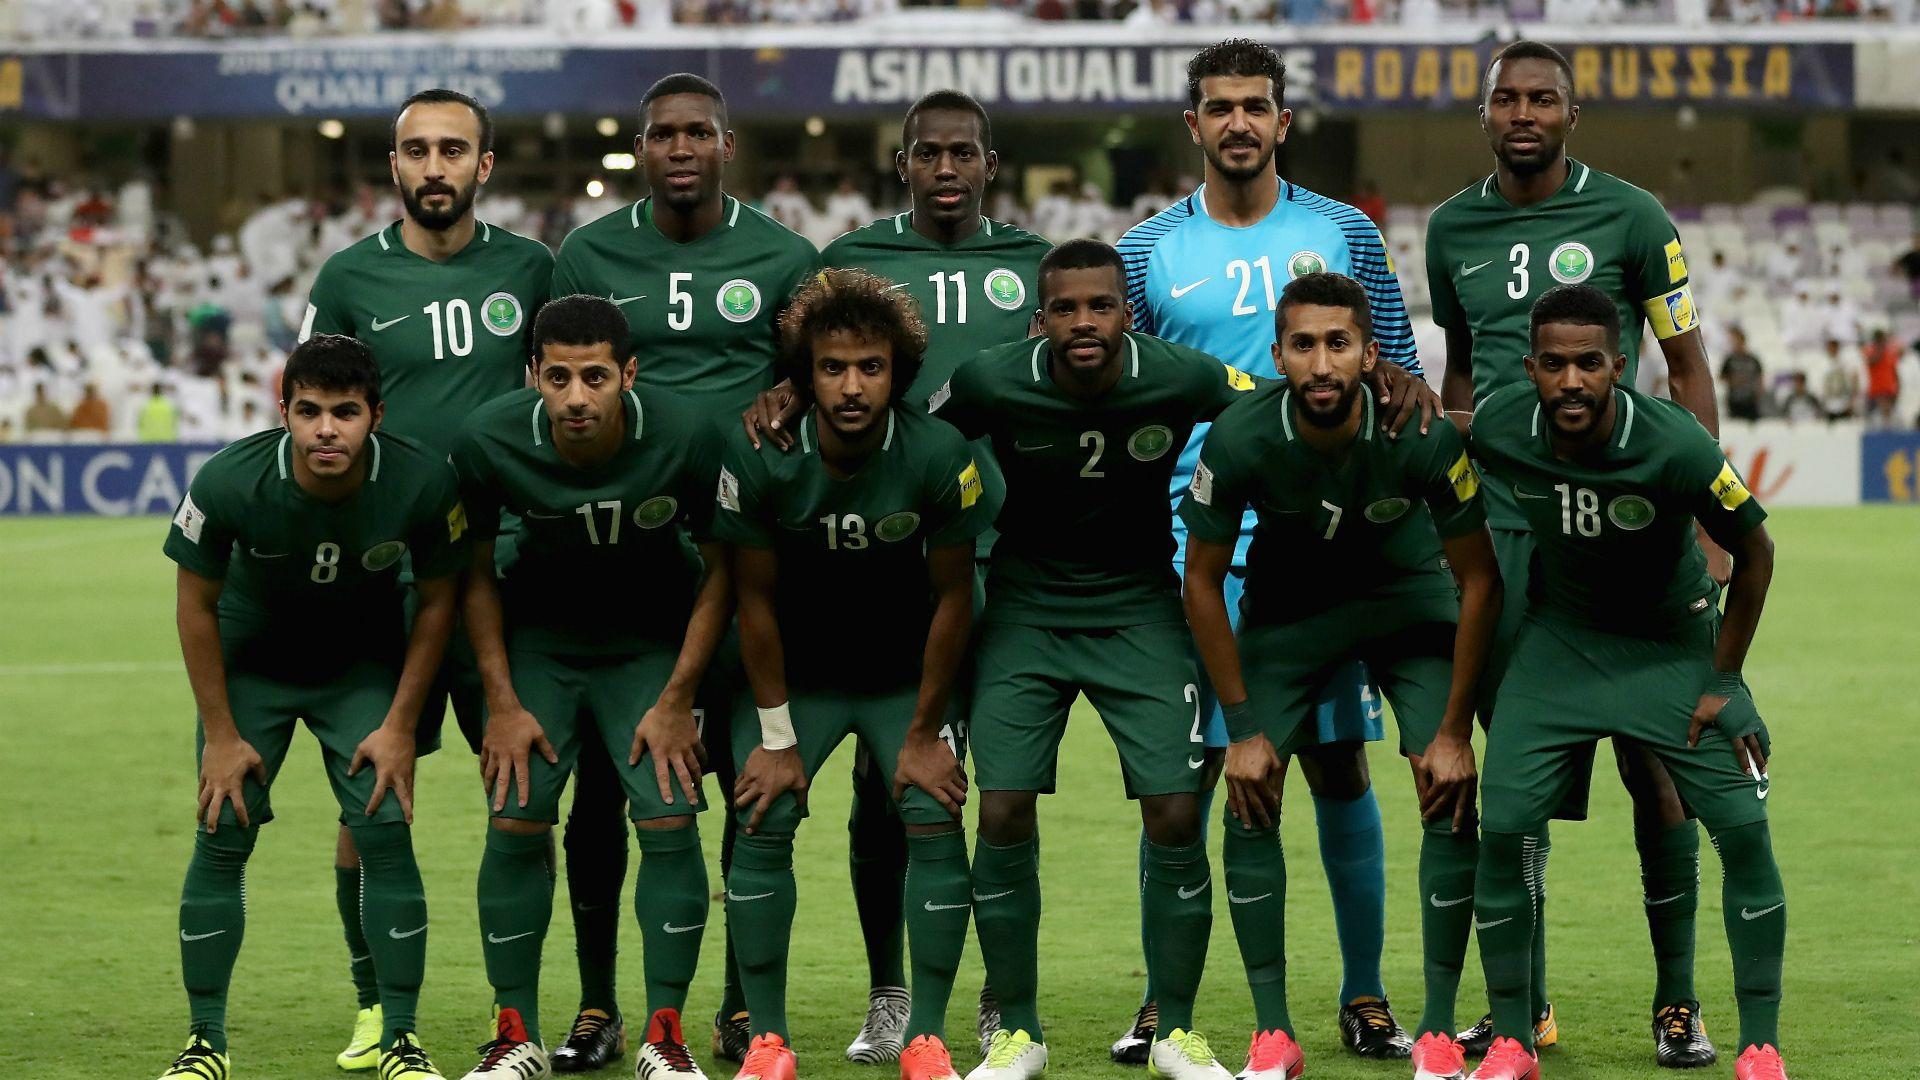 Saudi Arabia Football Team Wallpapers